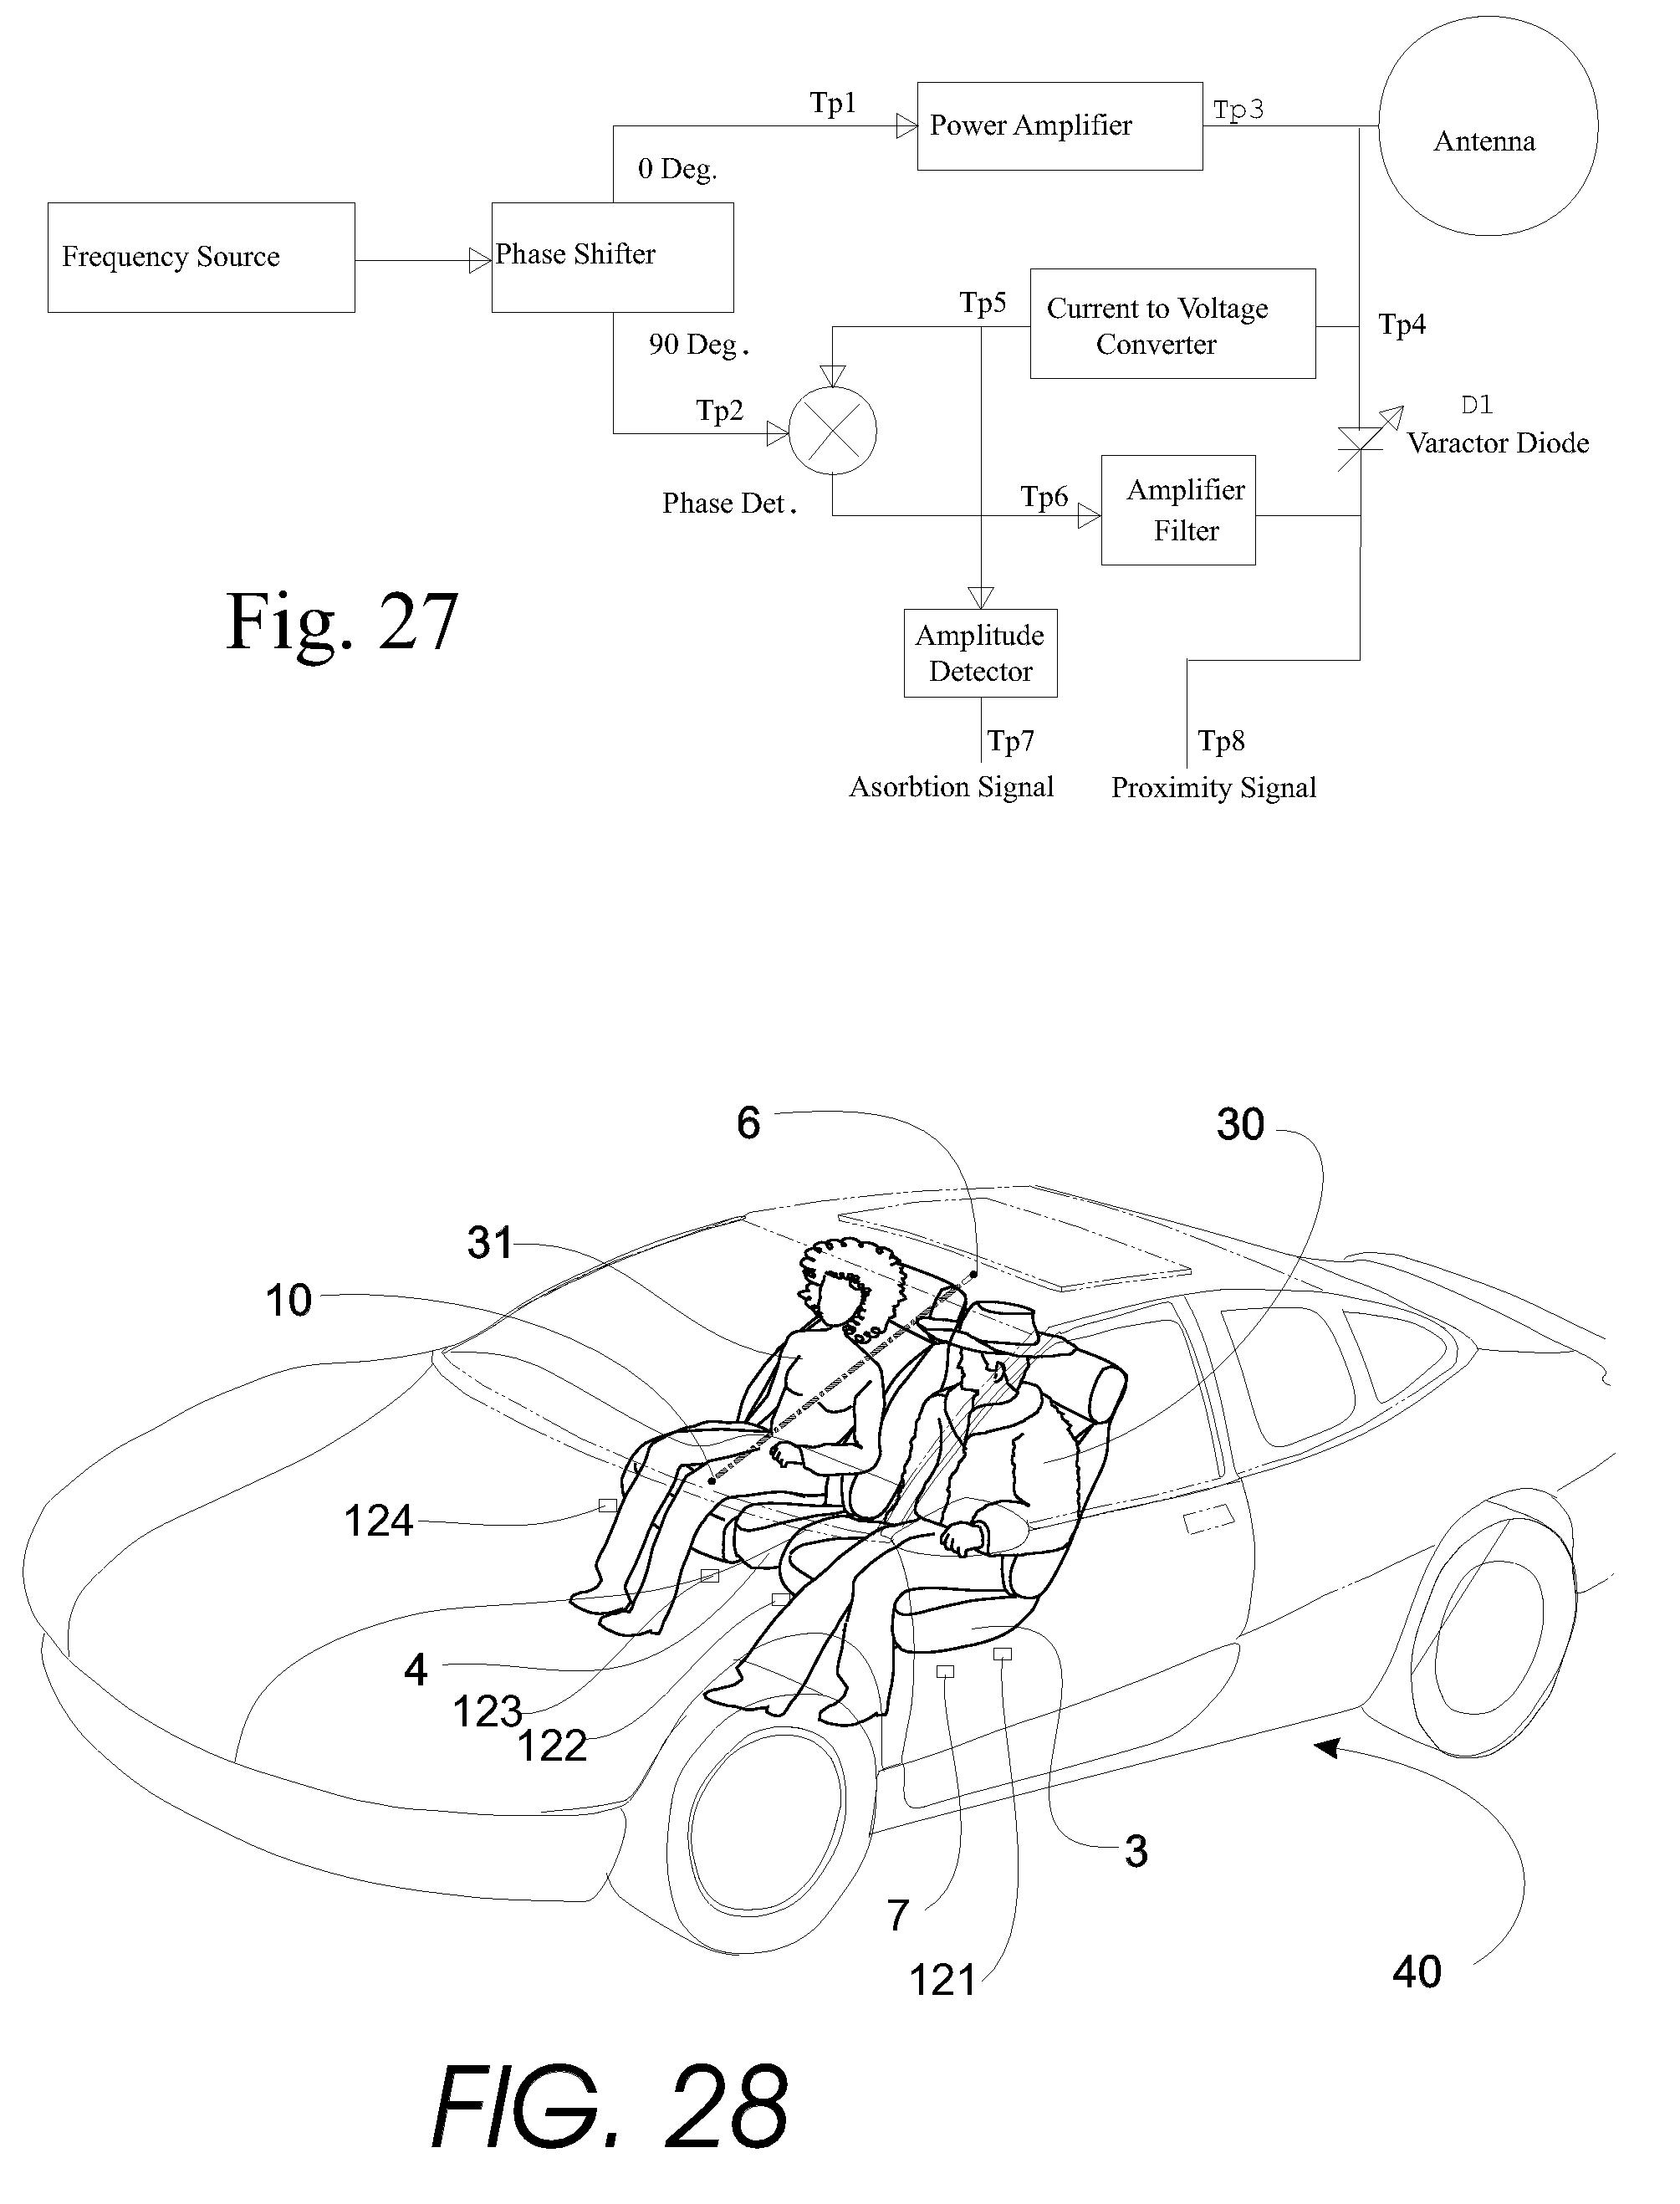 patent us 7 660 437 b2 40 Inch TV patent images